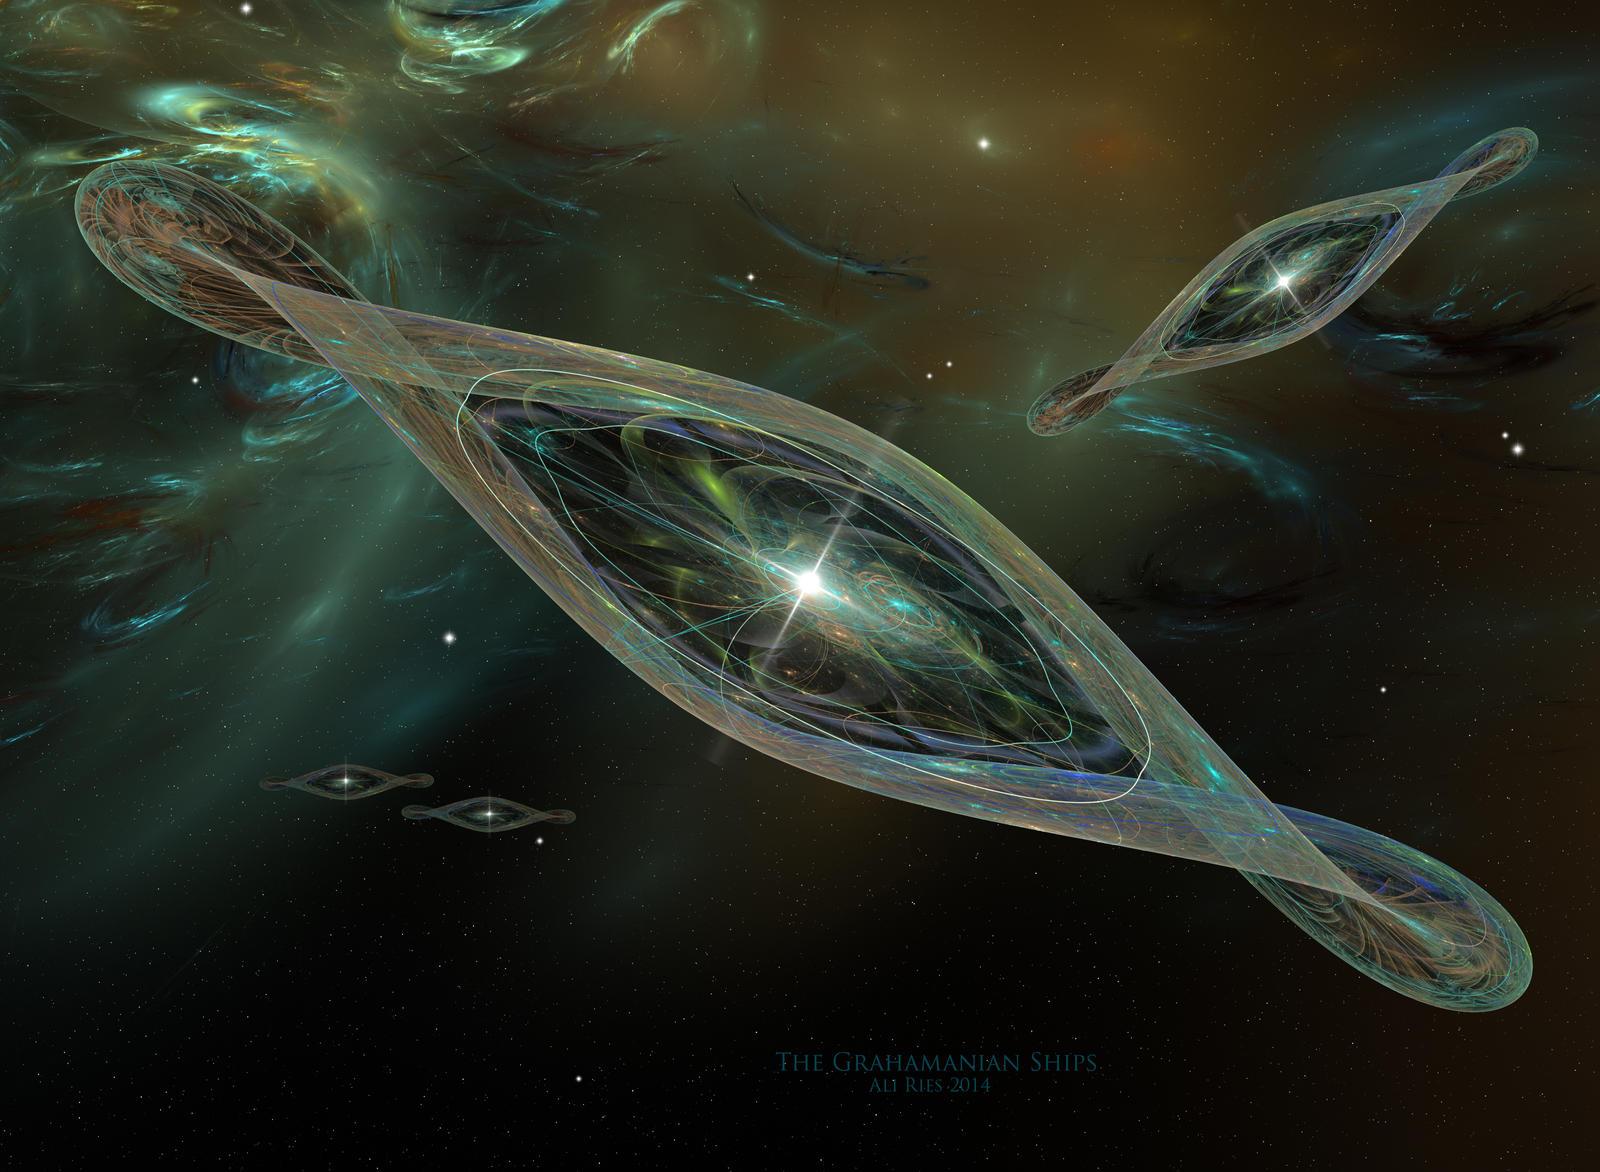 The Grahamanian Ships